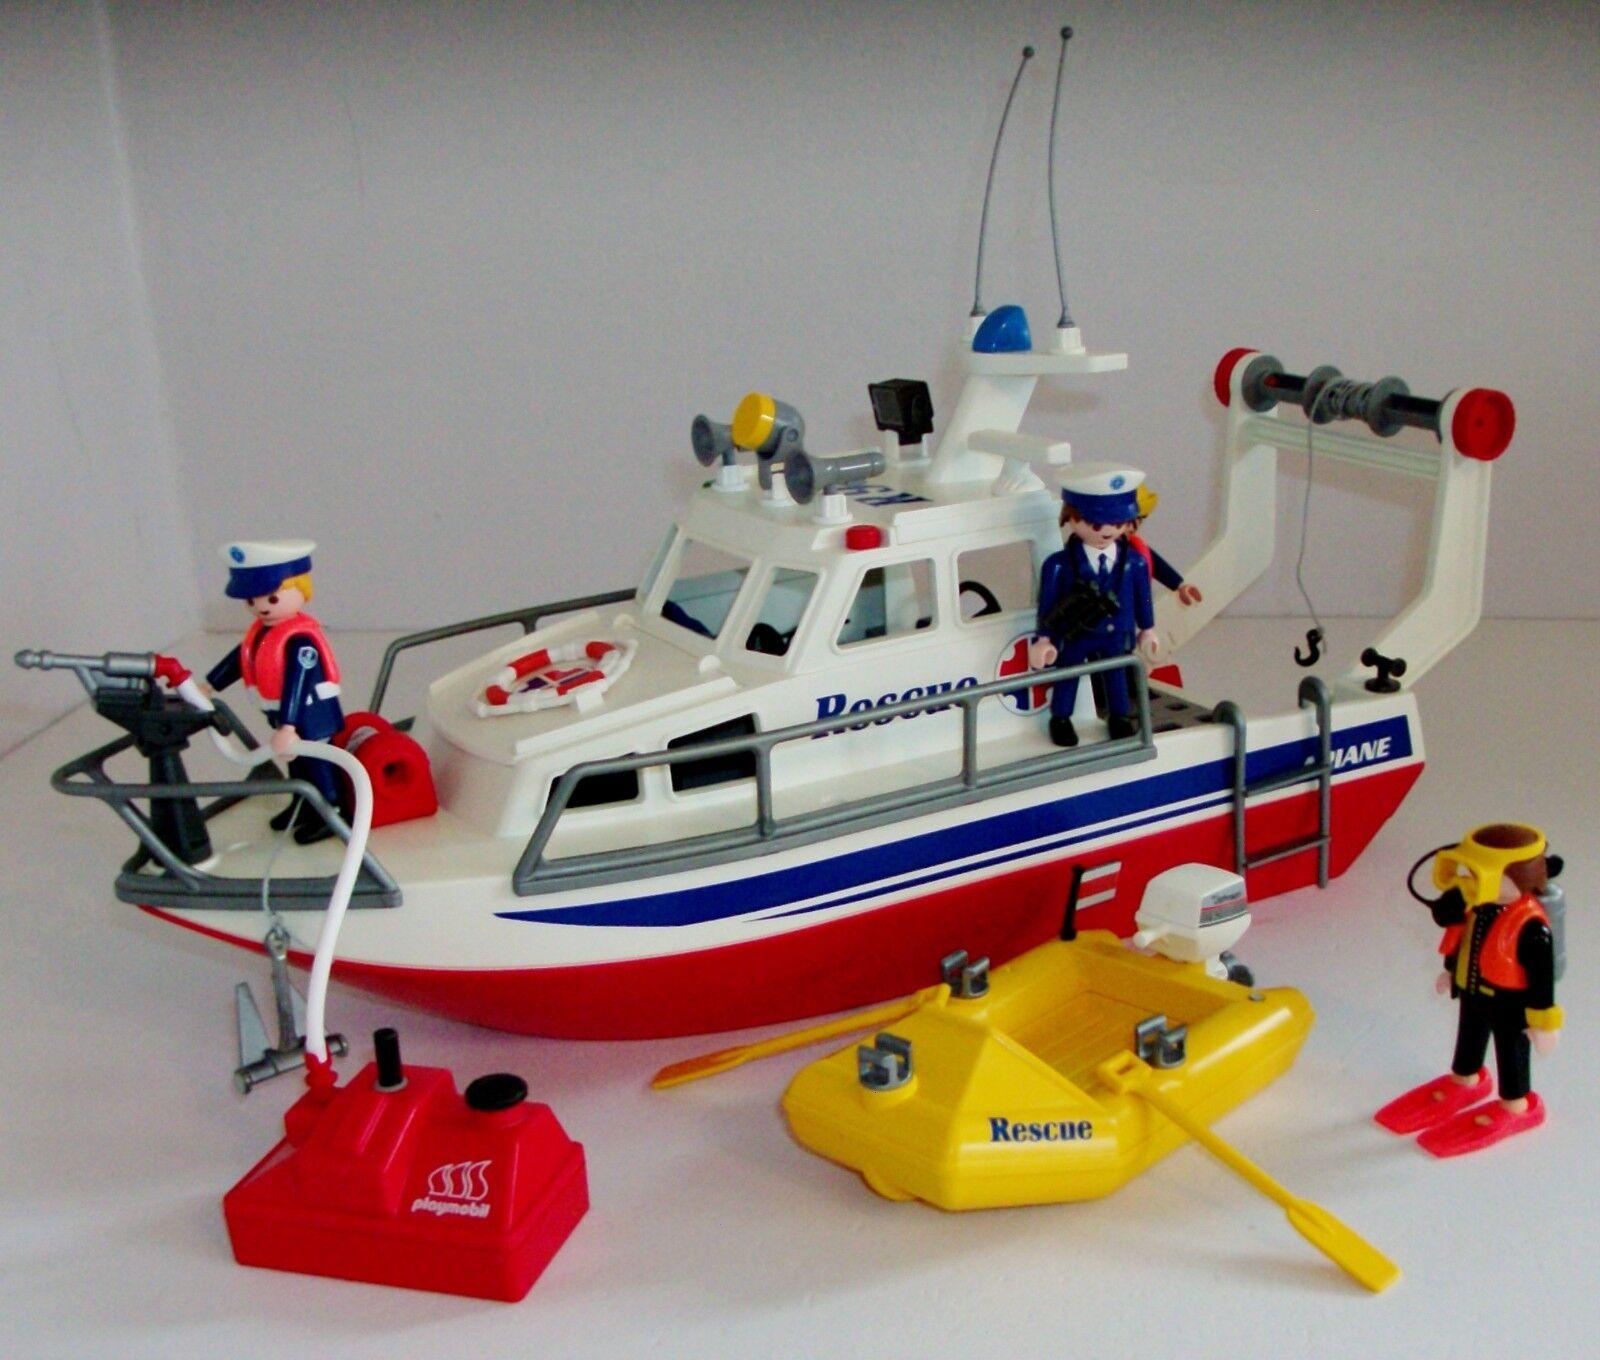 PLAYMOBIL Ricerca Costiera Nave di soccorso 3941